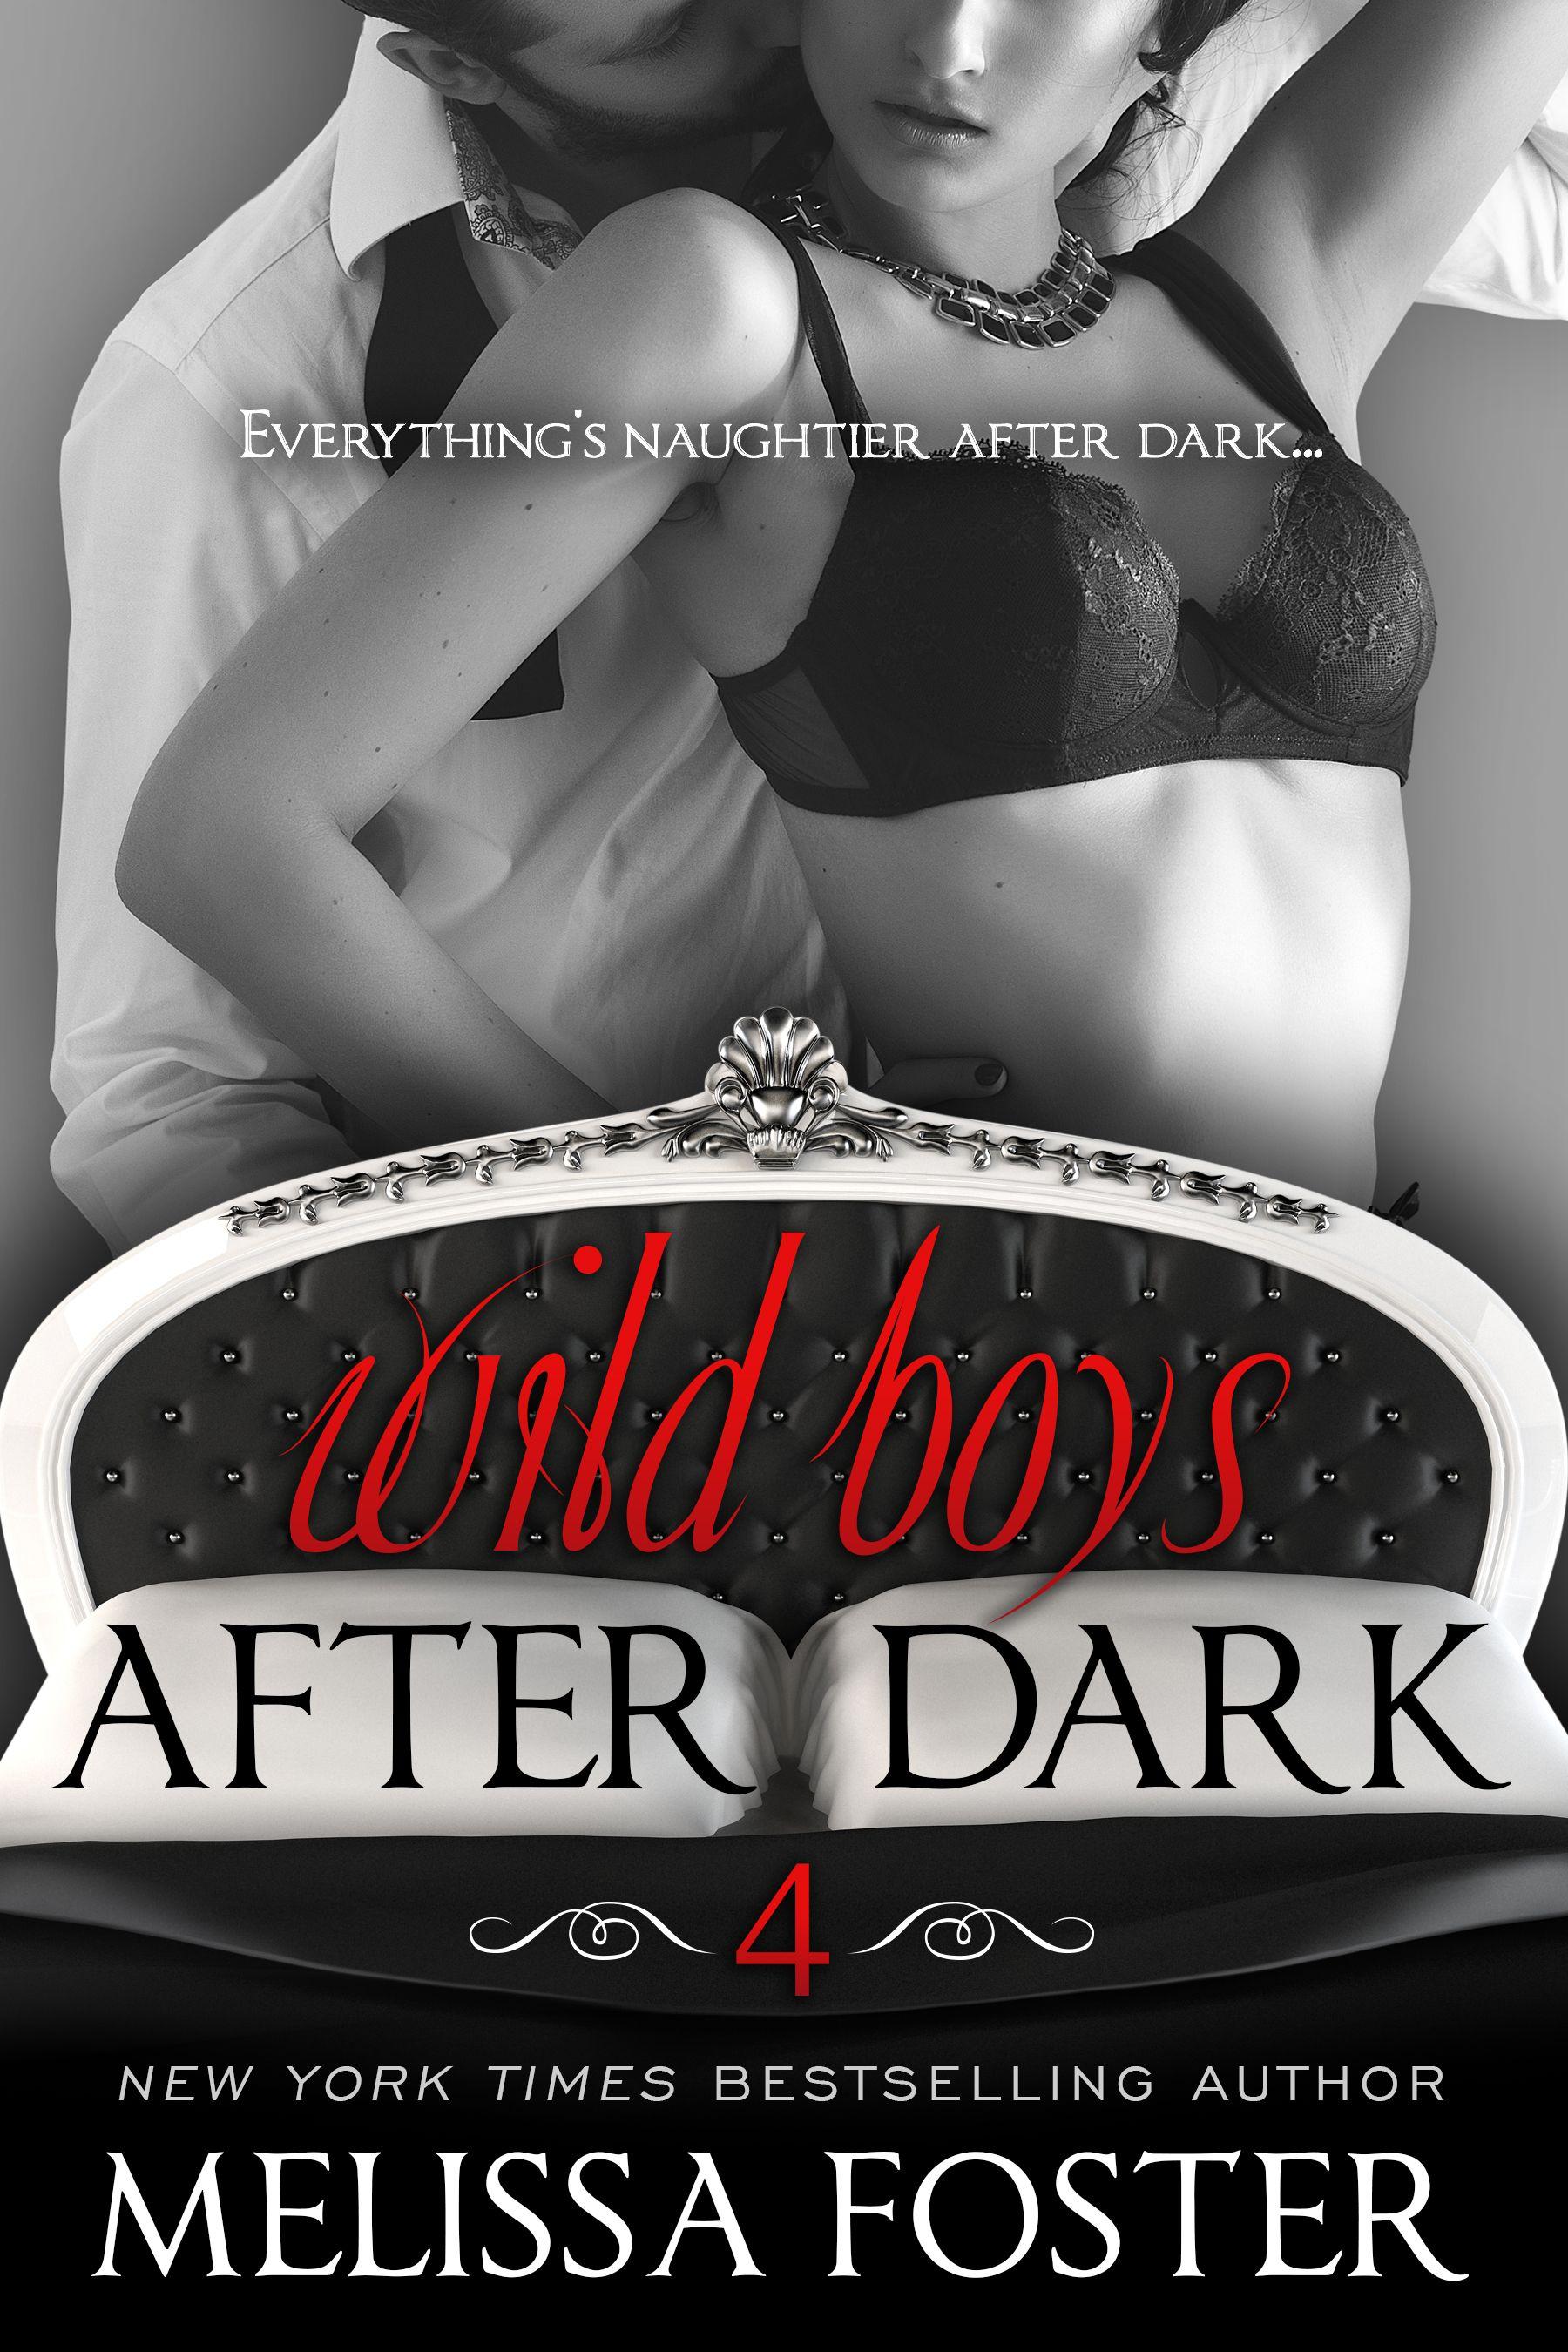 Cooper Wild Wild Boys Book Four After Dark Erotic Romance Novella Series Coming Soon Www Melissafoster Com Series After Dark